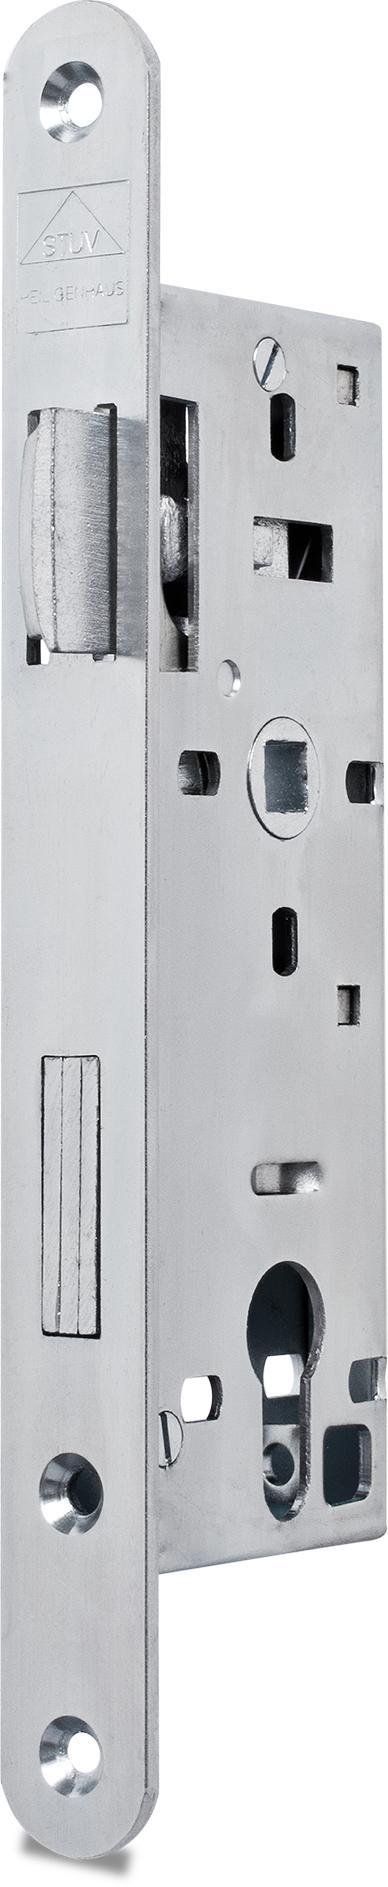 Einsteckschloss mit Wechsel, Dornmaß 35 mm, Entfernung 72 mm, Vierkantnuss 9 mm, Falle und Riegel bündig, DIN rechts (Falle nach Öffnen des Schlosses umlegbar)